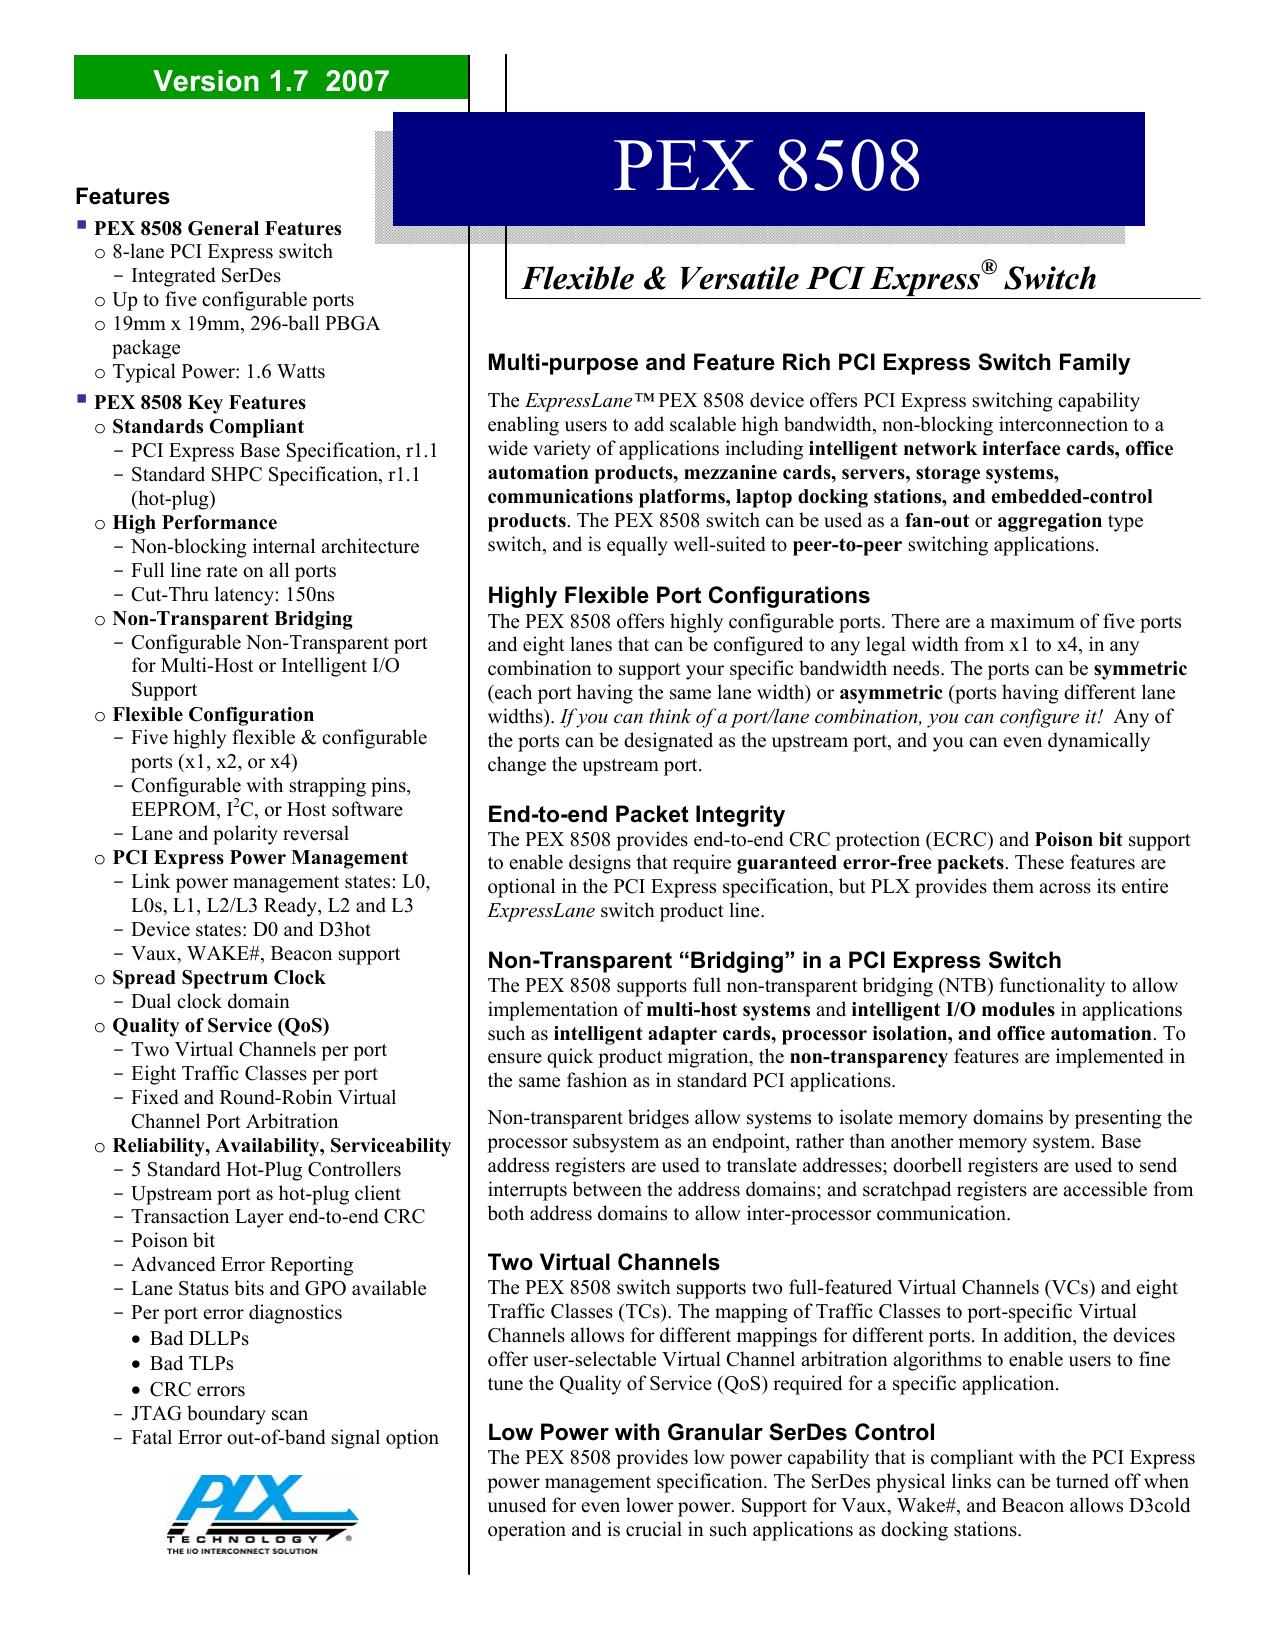 PEX8508-AC25BIG - PLX Technology - Iiic Cc   manualzz com